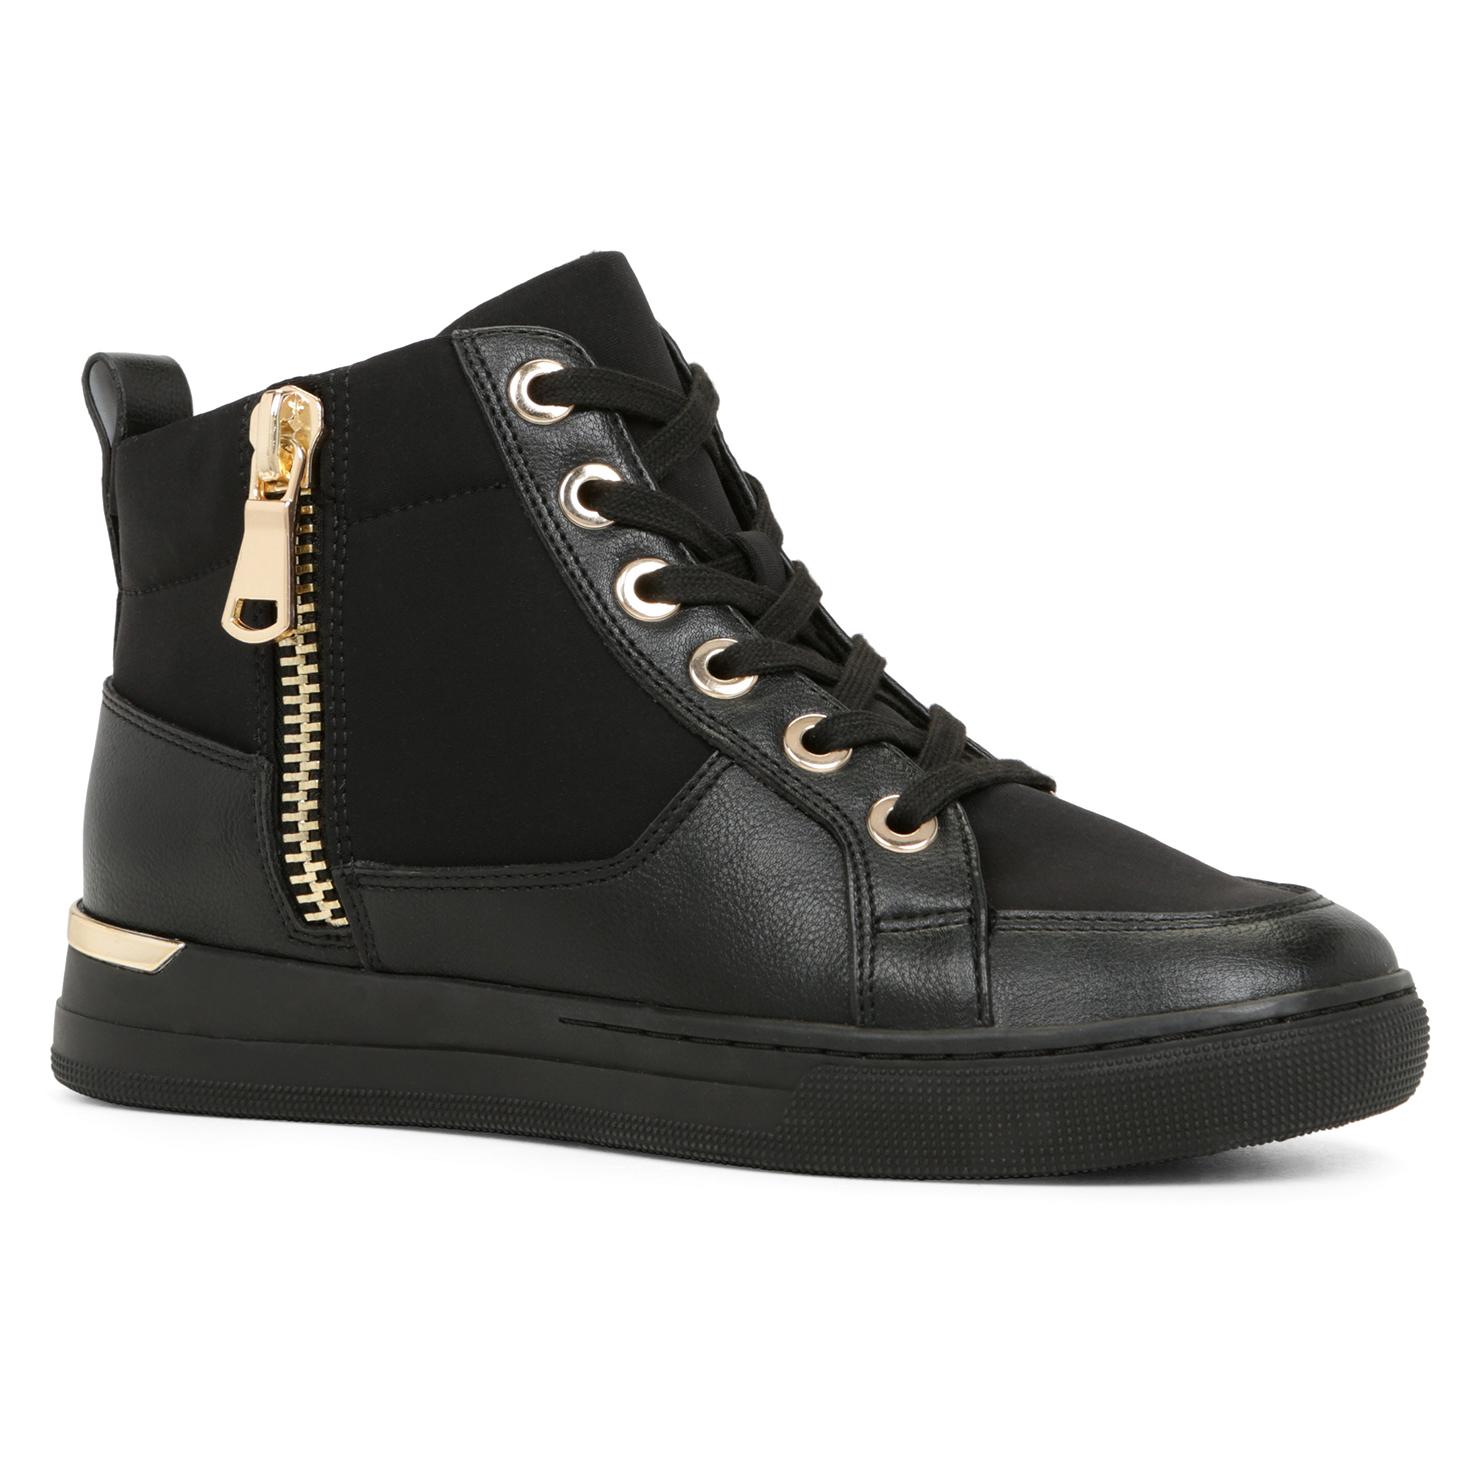 Aldo Shoes London Uk